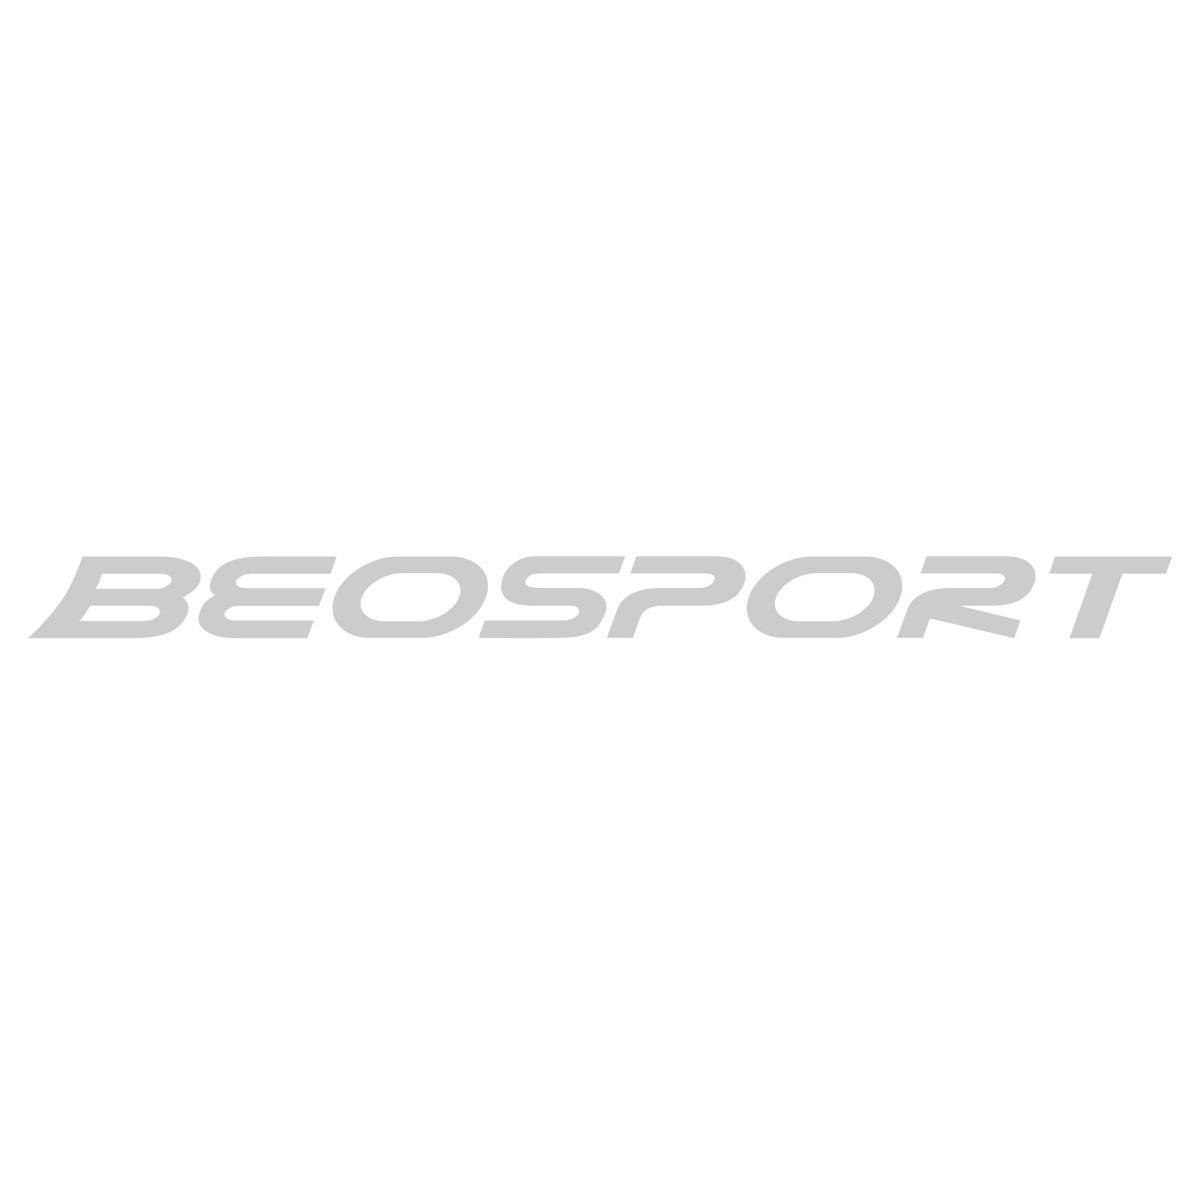 Wilson Luxilon Smart 1.25mm x 200m žica za reket